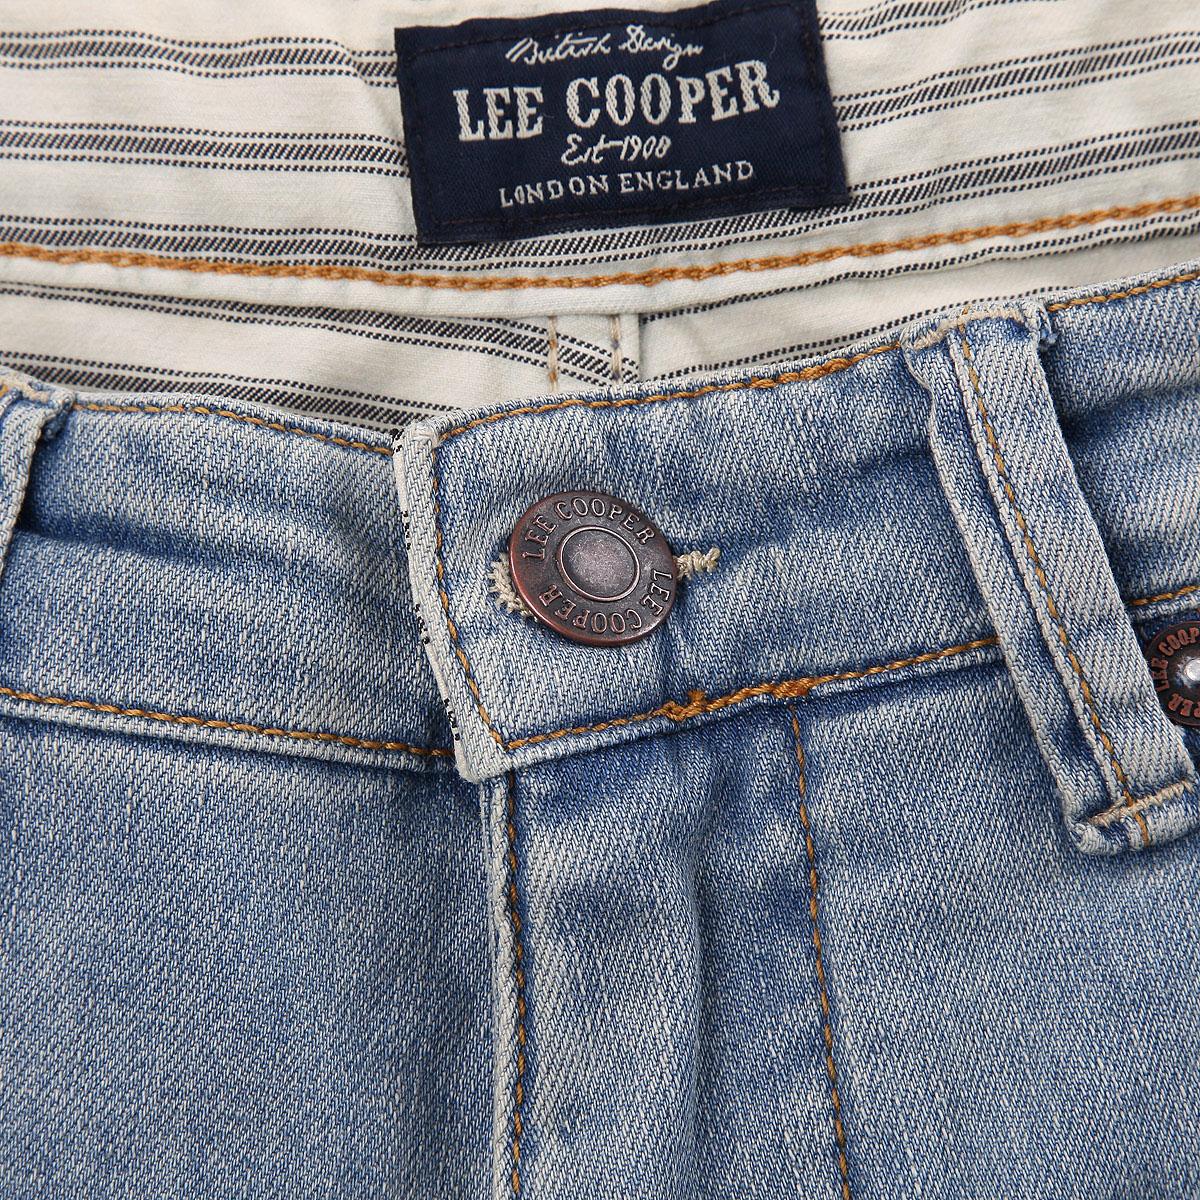 ������ �������. DANIEL - Lee CooperDANIEL/STONEBL�������� ������� ������ Lee Cooper Daniel ����������� �������� ��������� �� �������� ����������